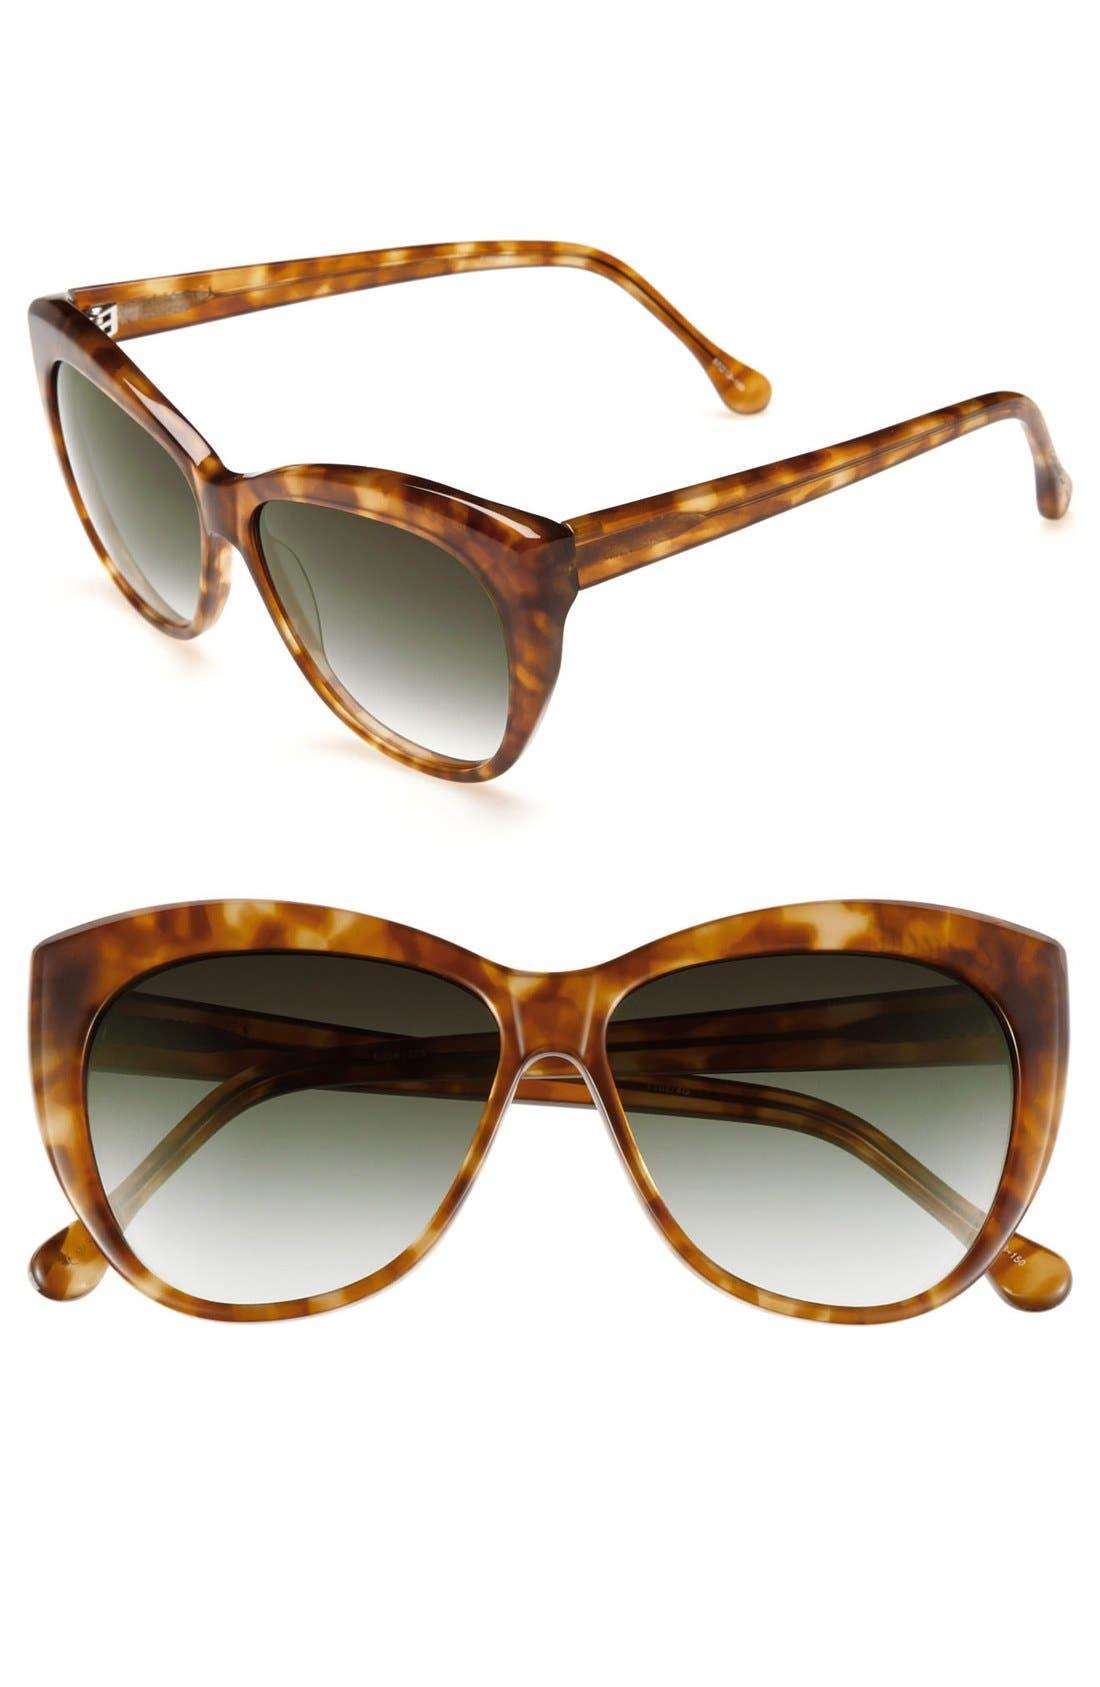 Alternate Image 1 Selected - Elizabeth and James 'Crescent' 57mm Sunglasses